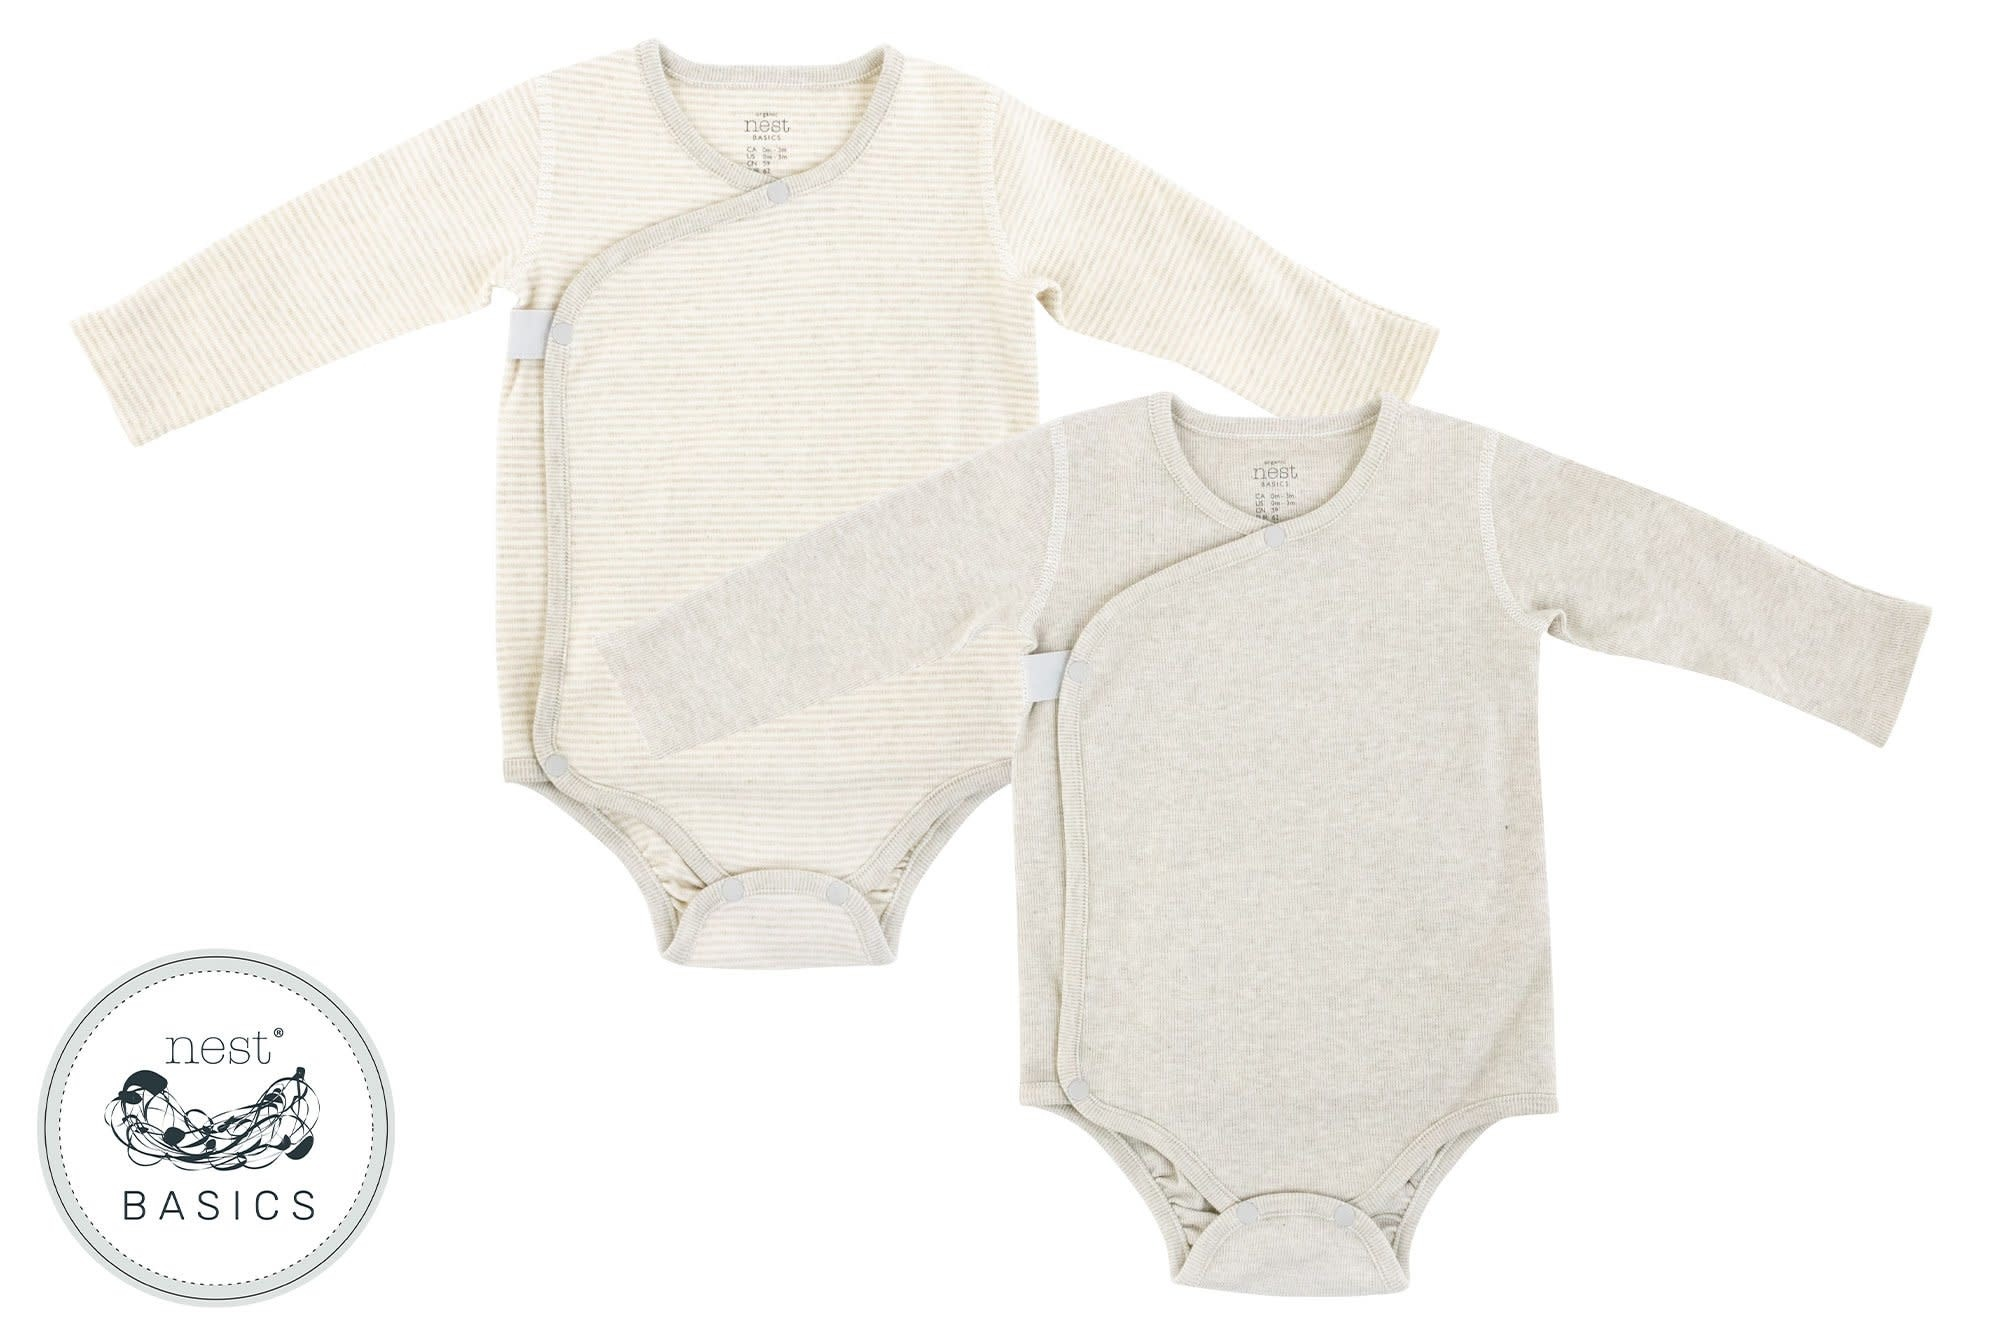 Nest Designs Basics Ribbed Long Sleeve Onesie - Light Grey